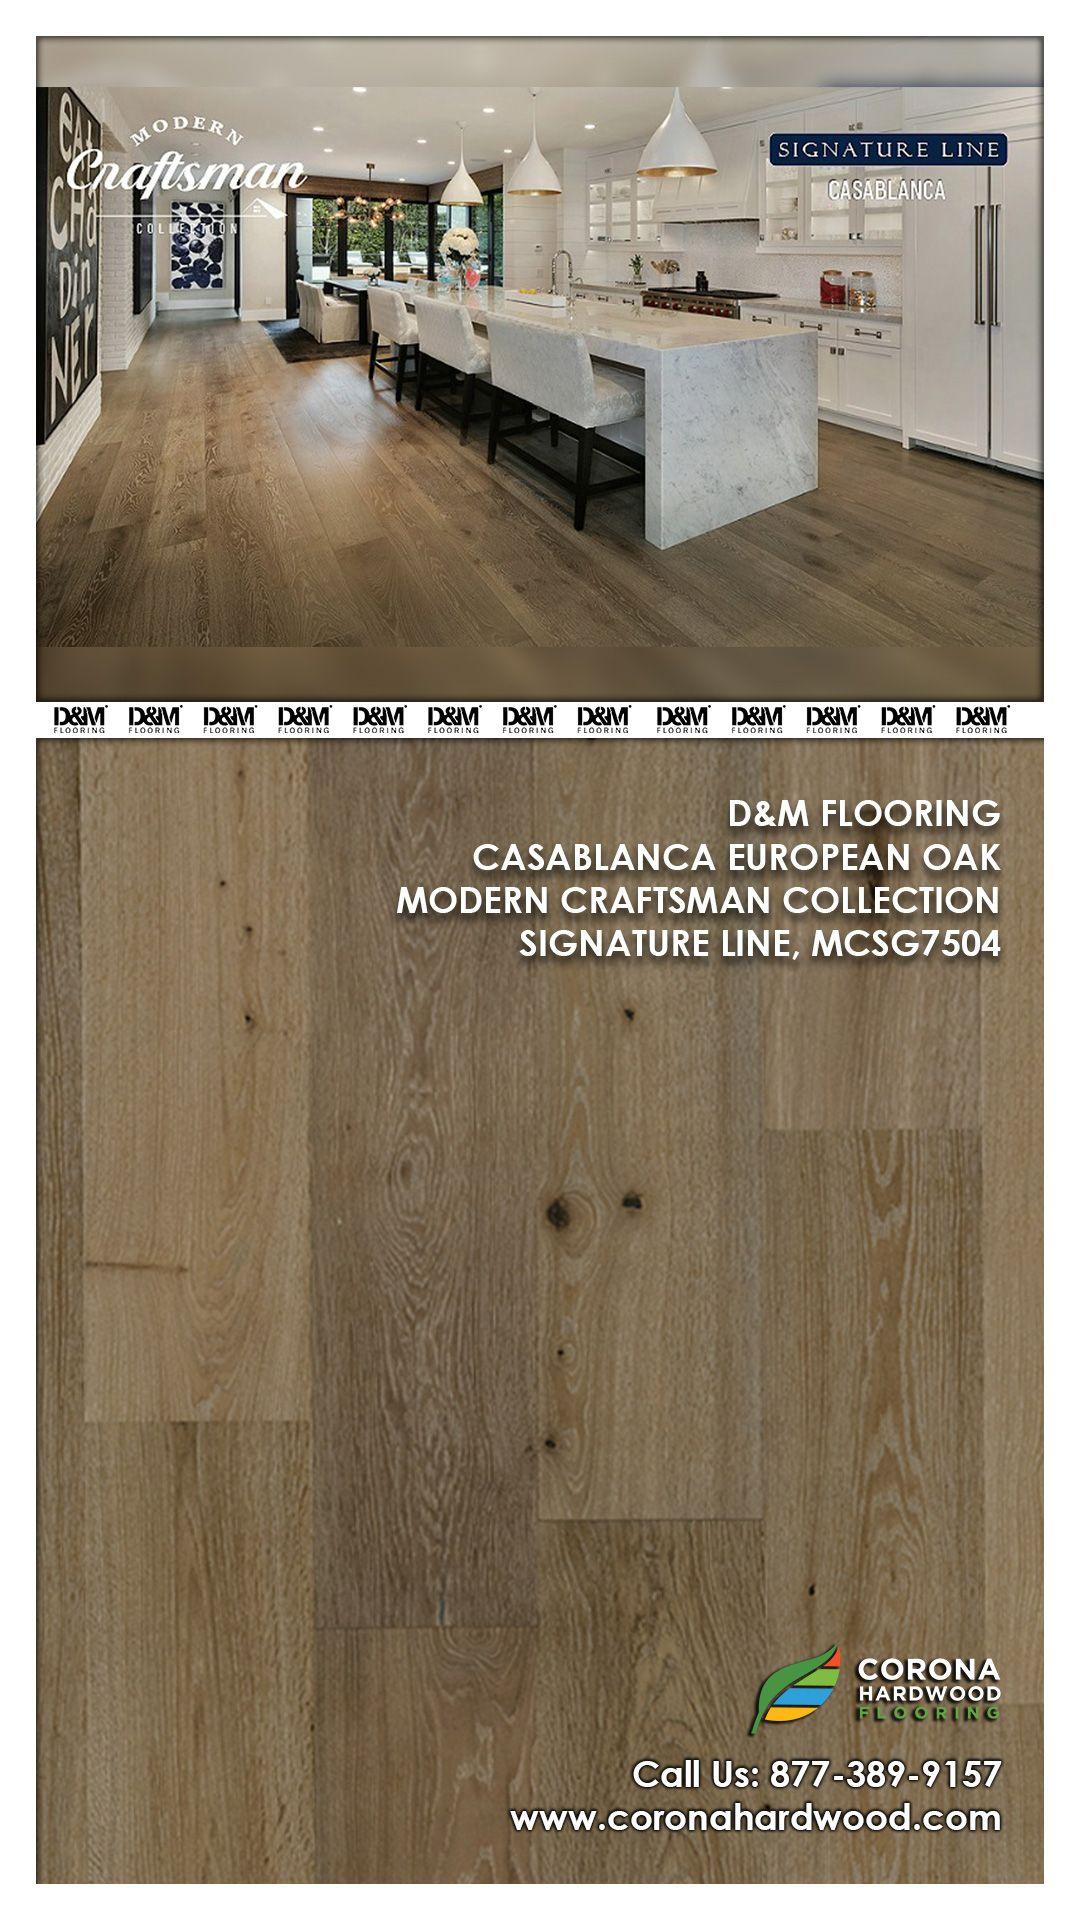 Rich Smoky Finish And Wide Planks Wide Plank Modern Craftsman Oak Planks